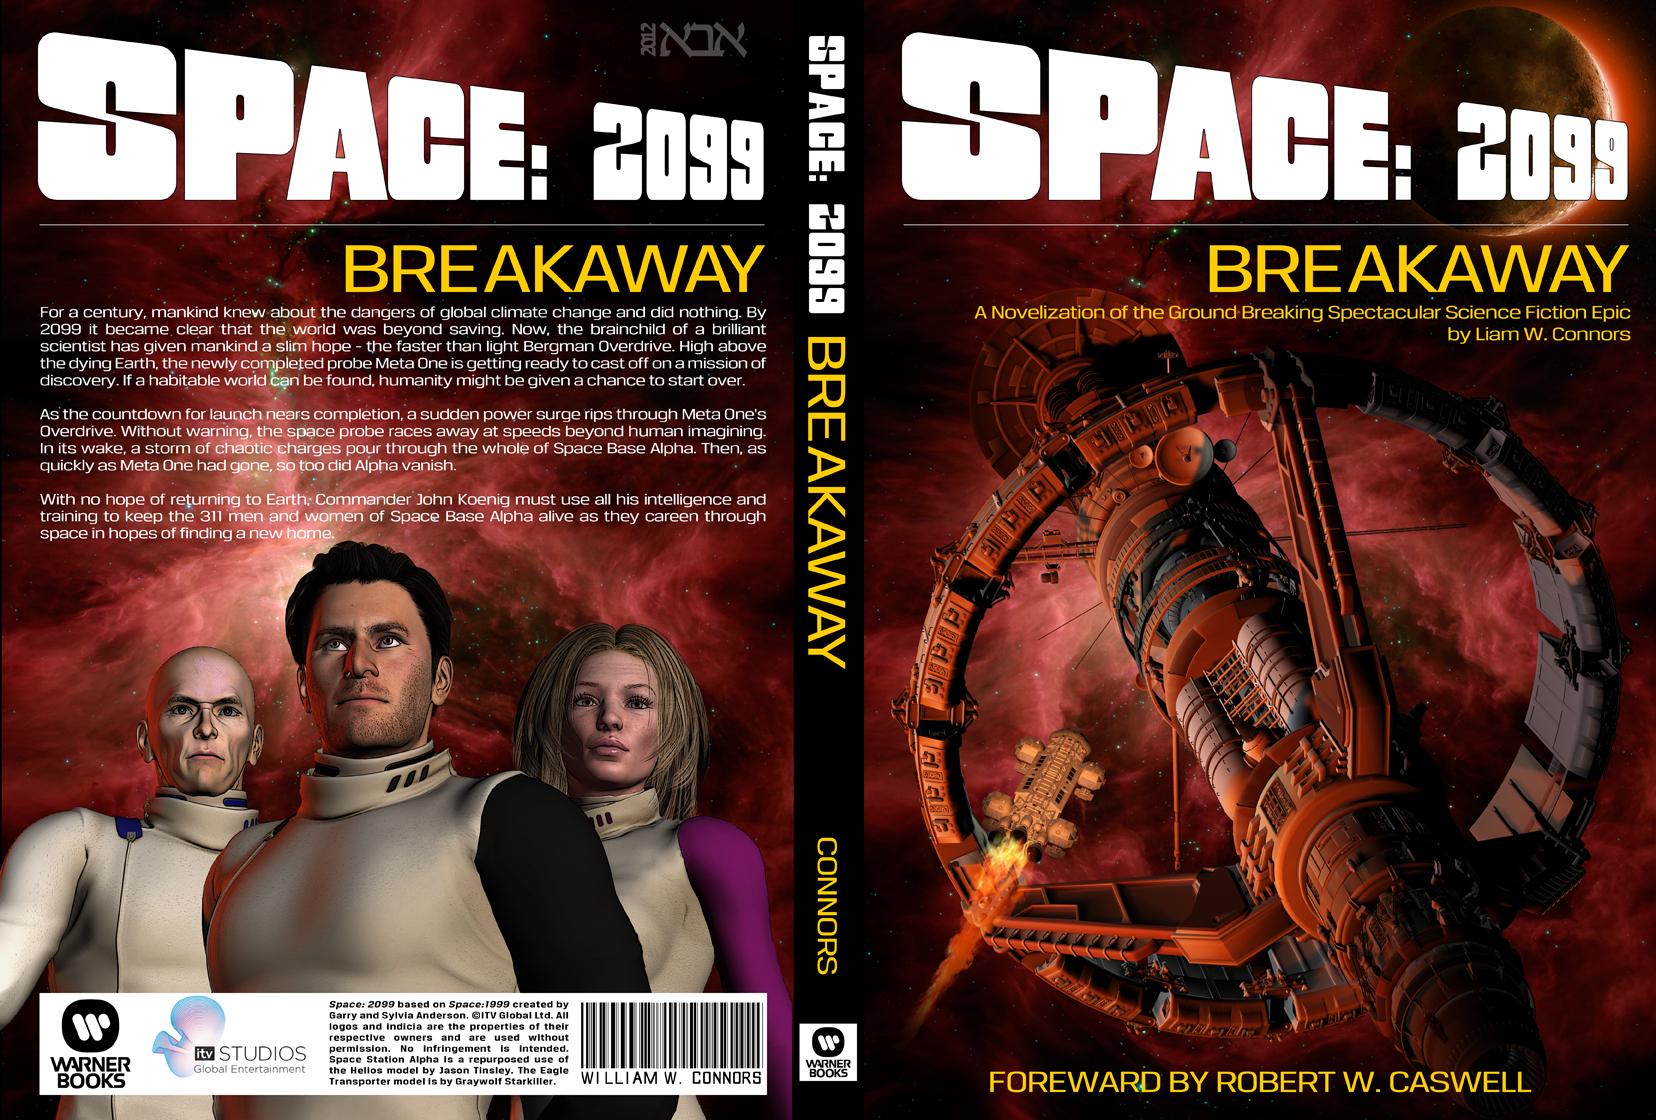 Space: 2099 01 Breakaway by AbaKon